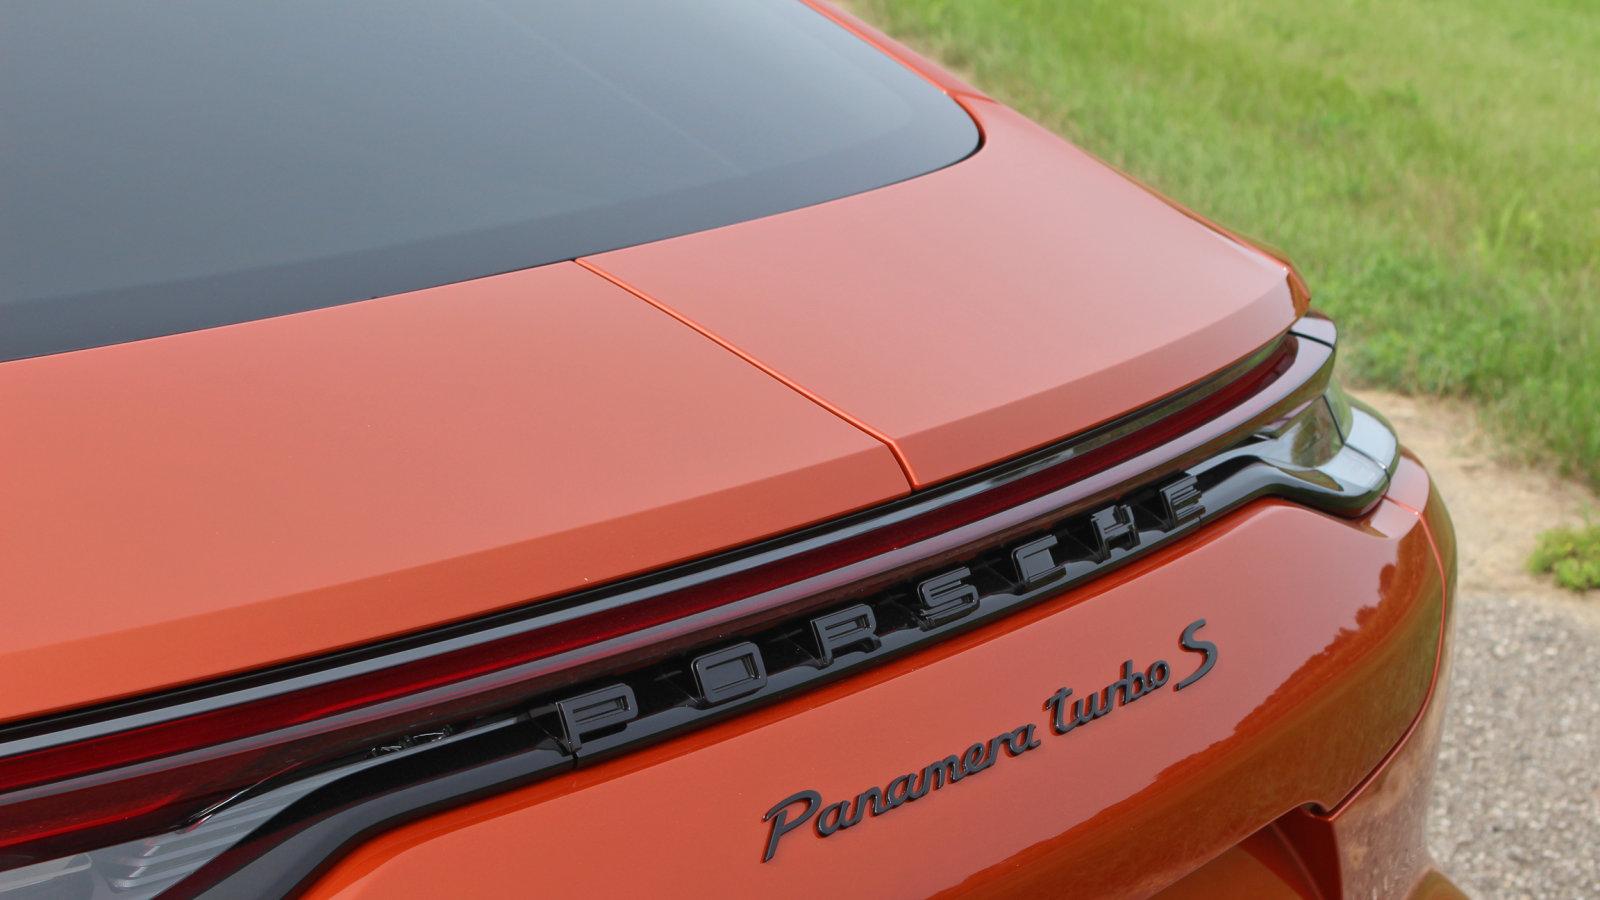 2021 Porsche Panamera Turbo S Testimonial|Perceptions, images, efficiency